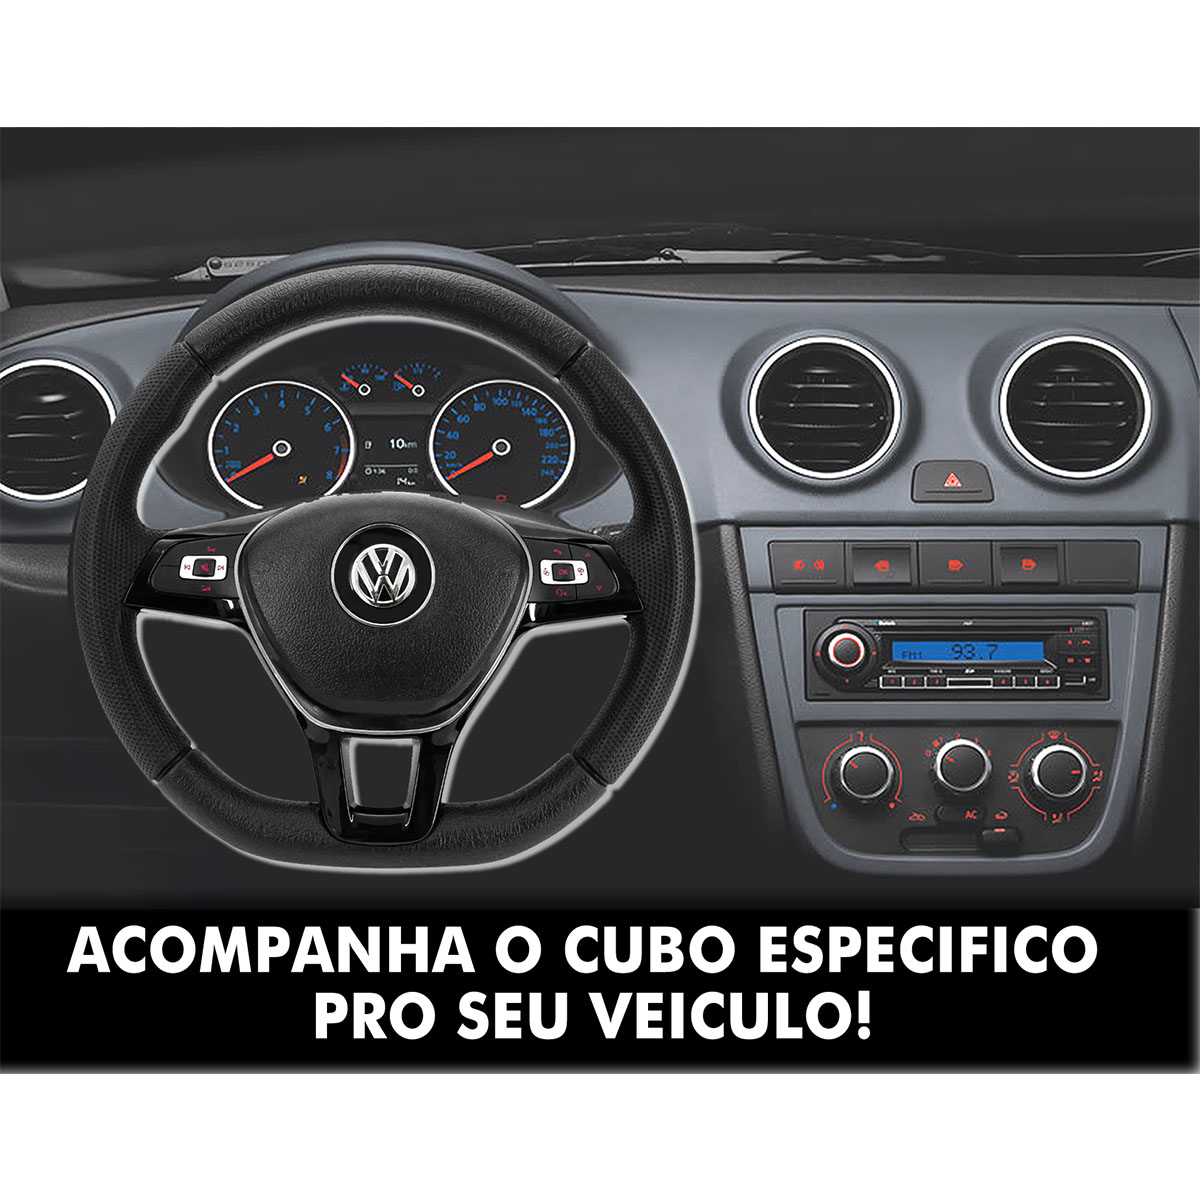 Volante Multifuncional Volkswagen G7 Esportivo Cubo Gol Quadrado G2 G3 G4 G5 1980 a 2013 Poliparts